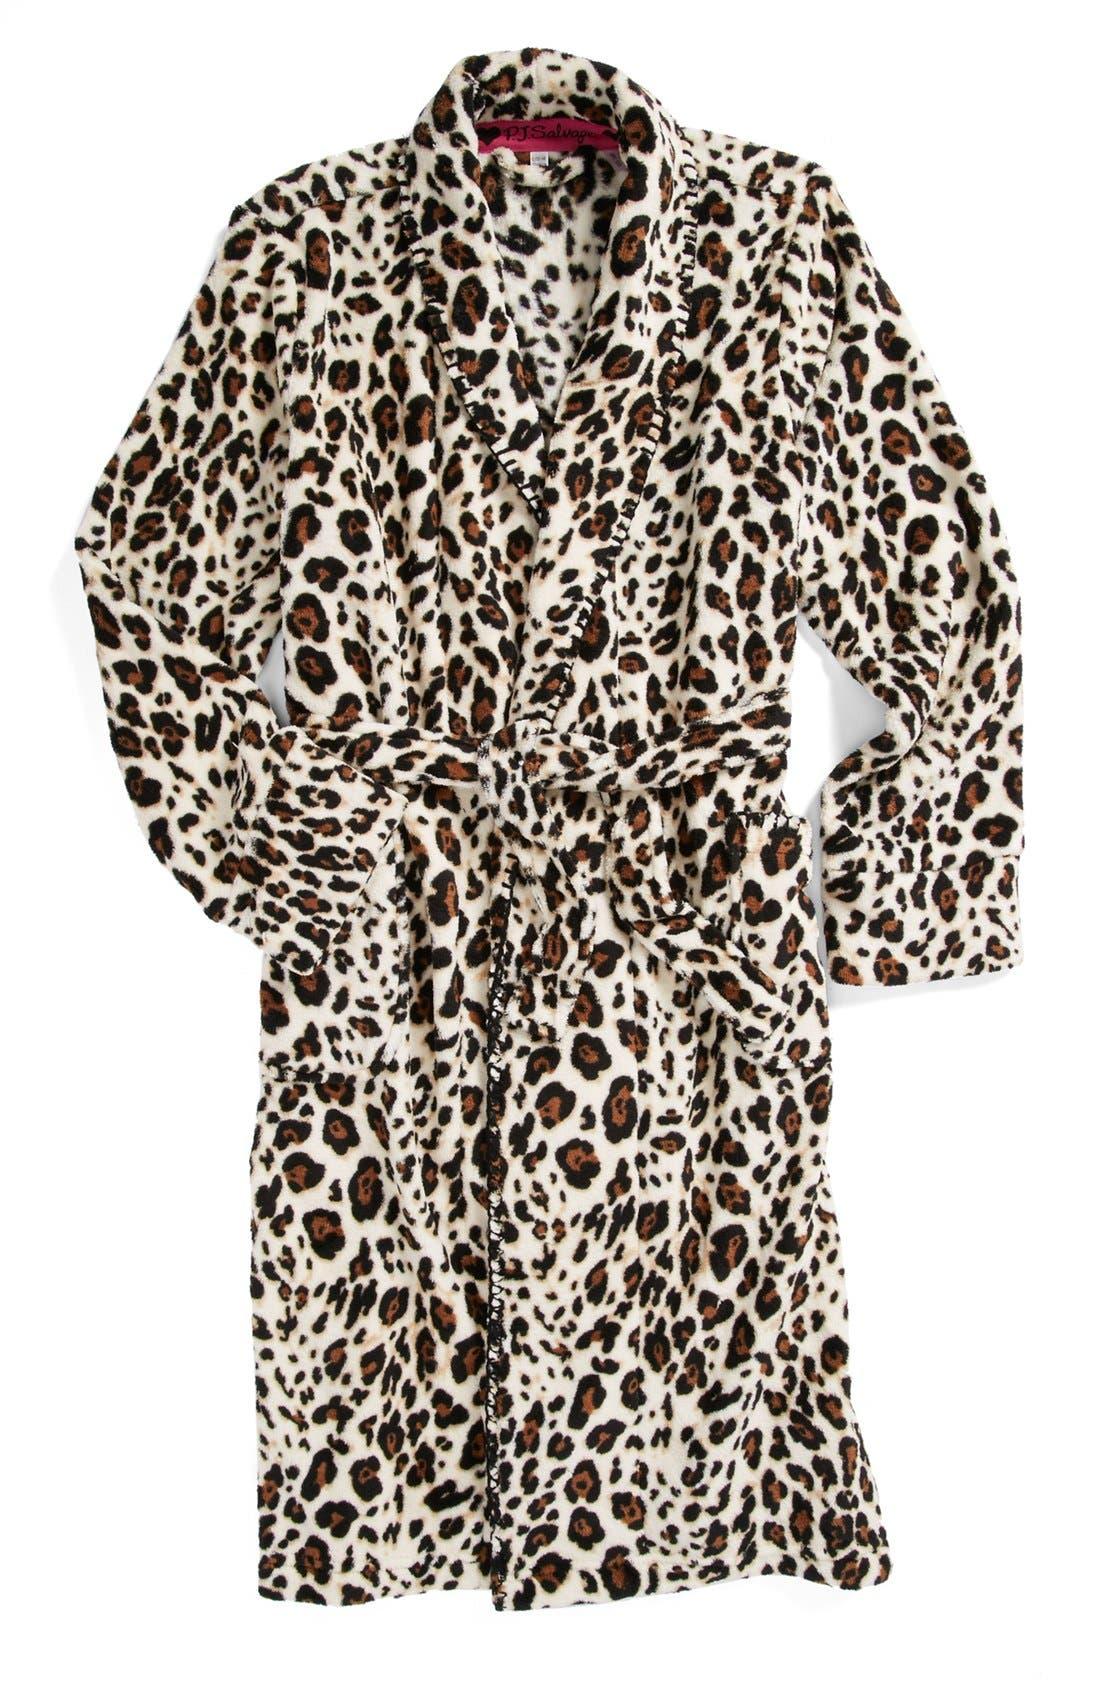 Alternate Image 1 Selected - PJ Salvage 'Here Kitty Kitty' Robe (Little Girls & Big Girls)